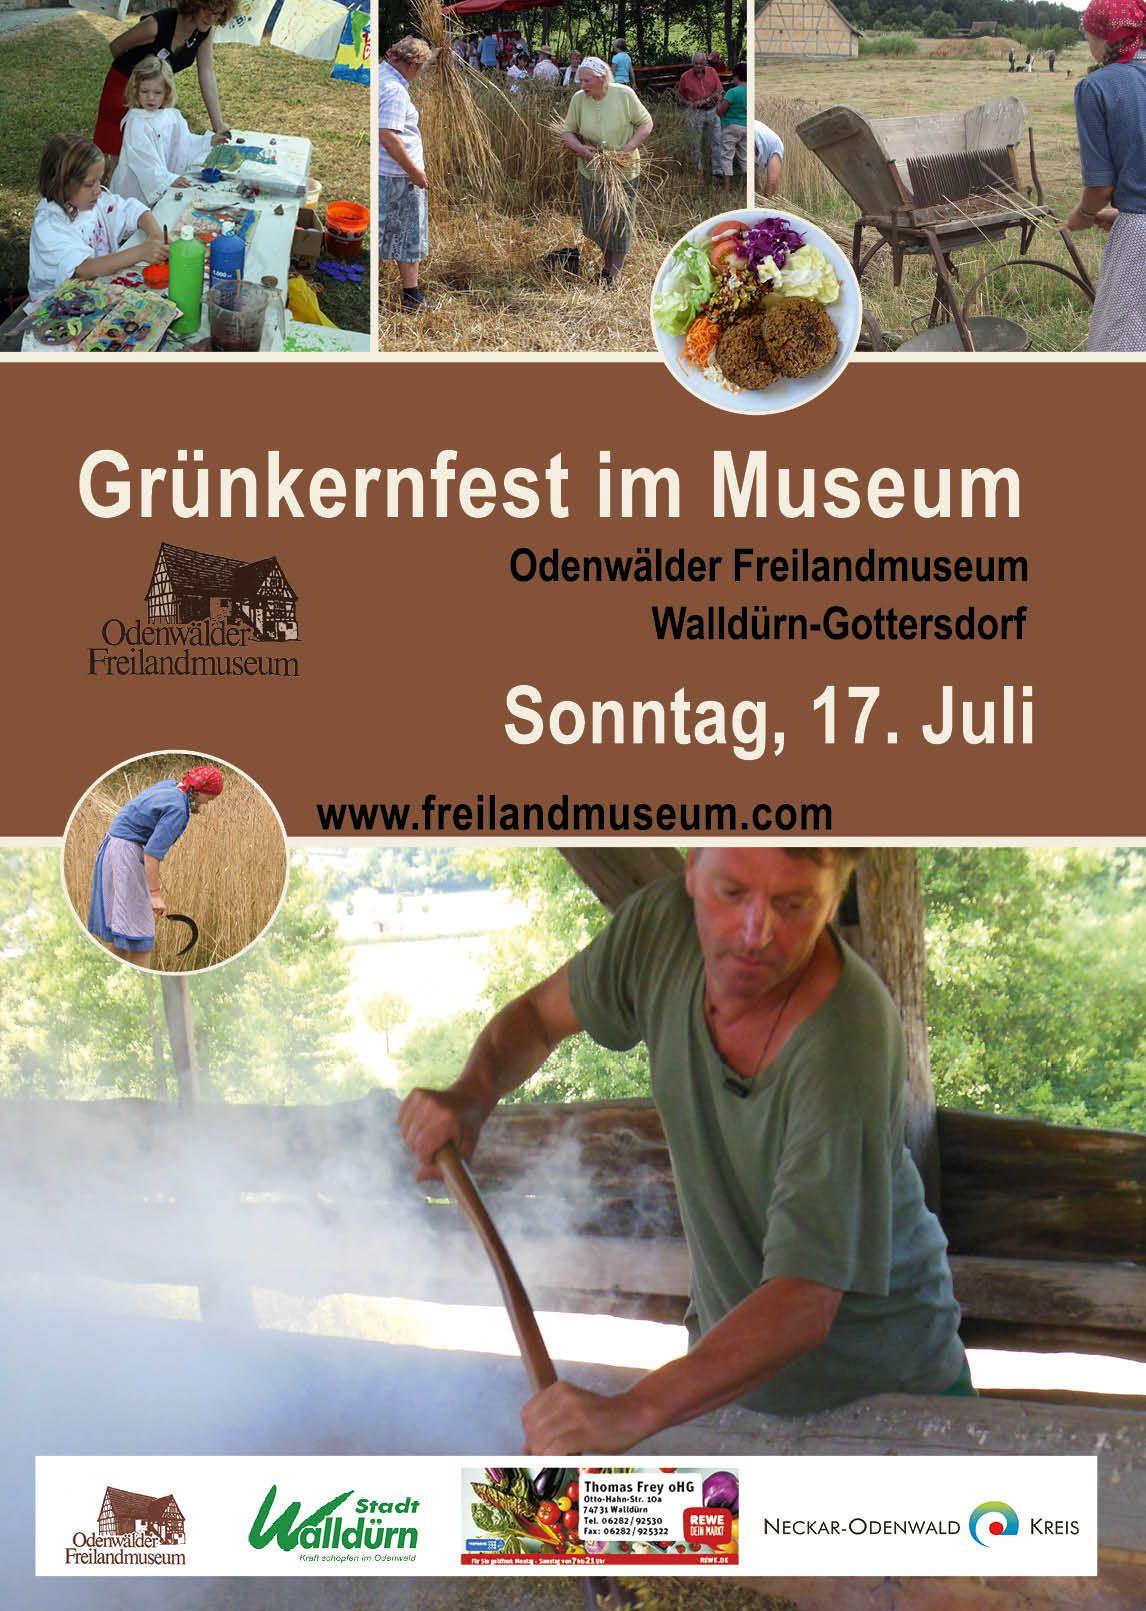 Freilandmuseum_Grünkernfest_2016